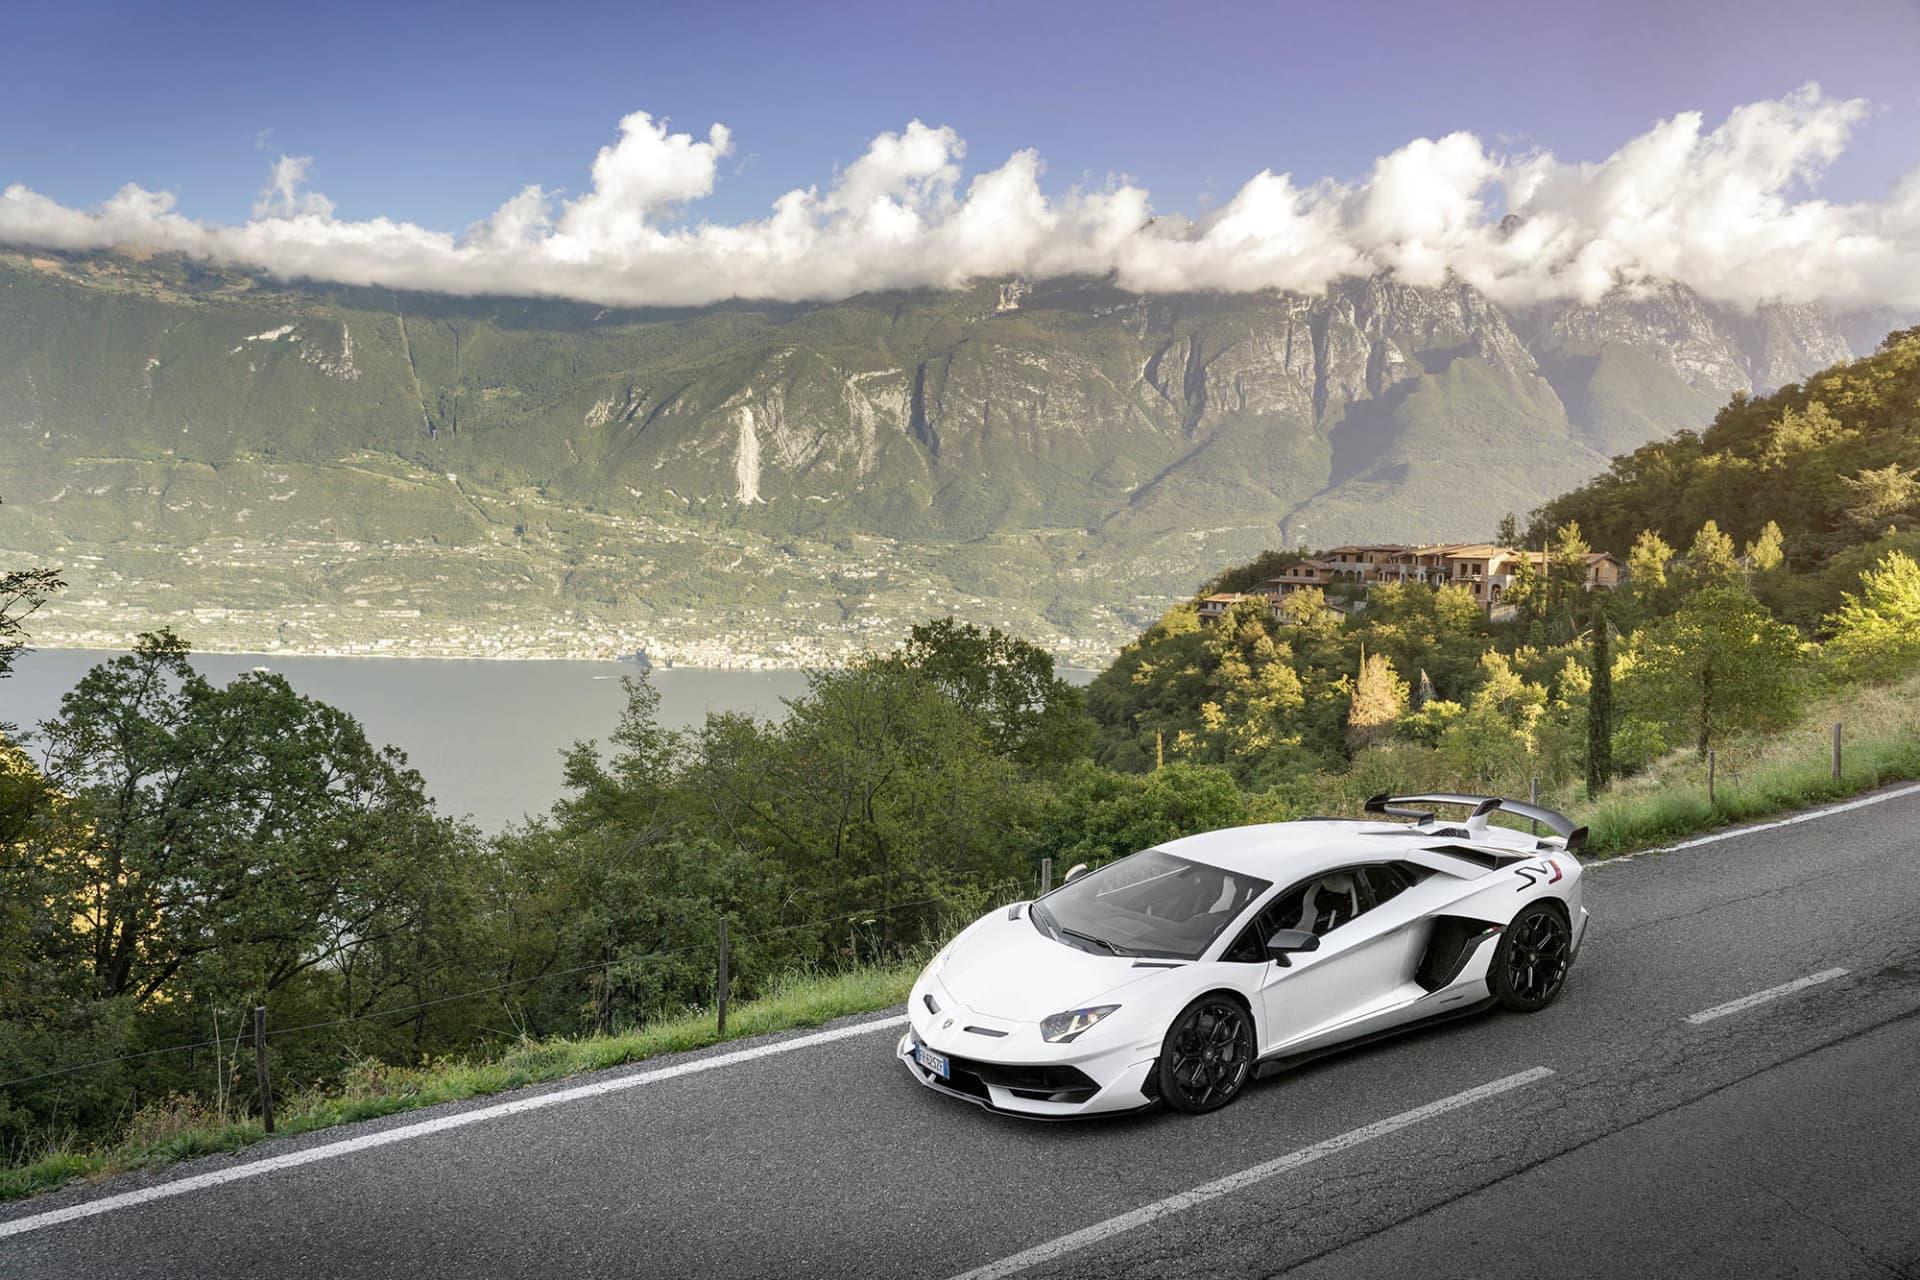 Lamborghini Aventador SVJ, utan disruption den hårdaste tjuren från Sant'Agata Bolognese! I bakgrunden Garda Sjön.